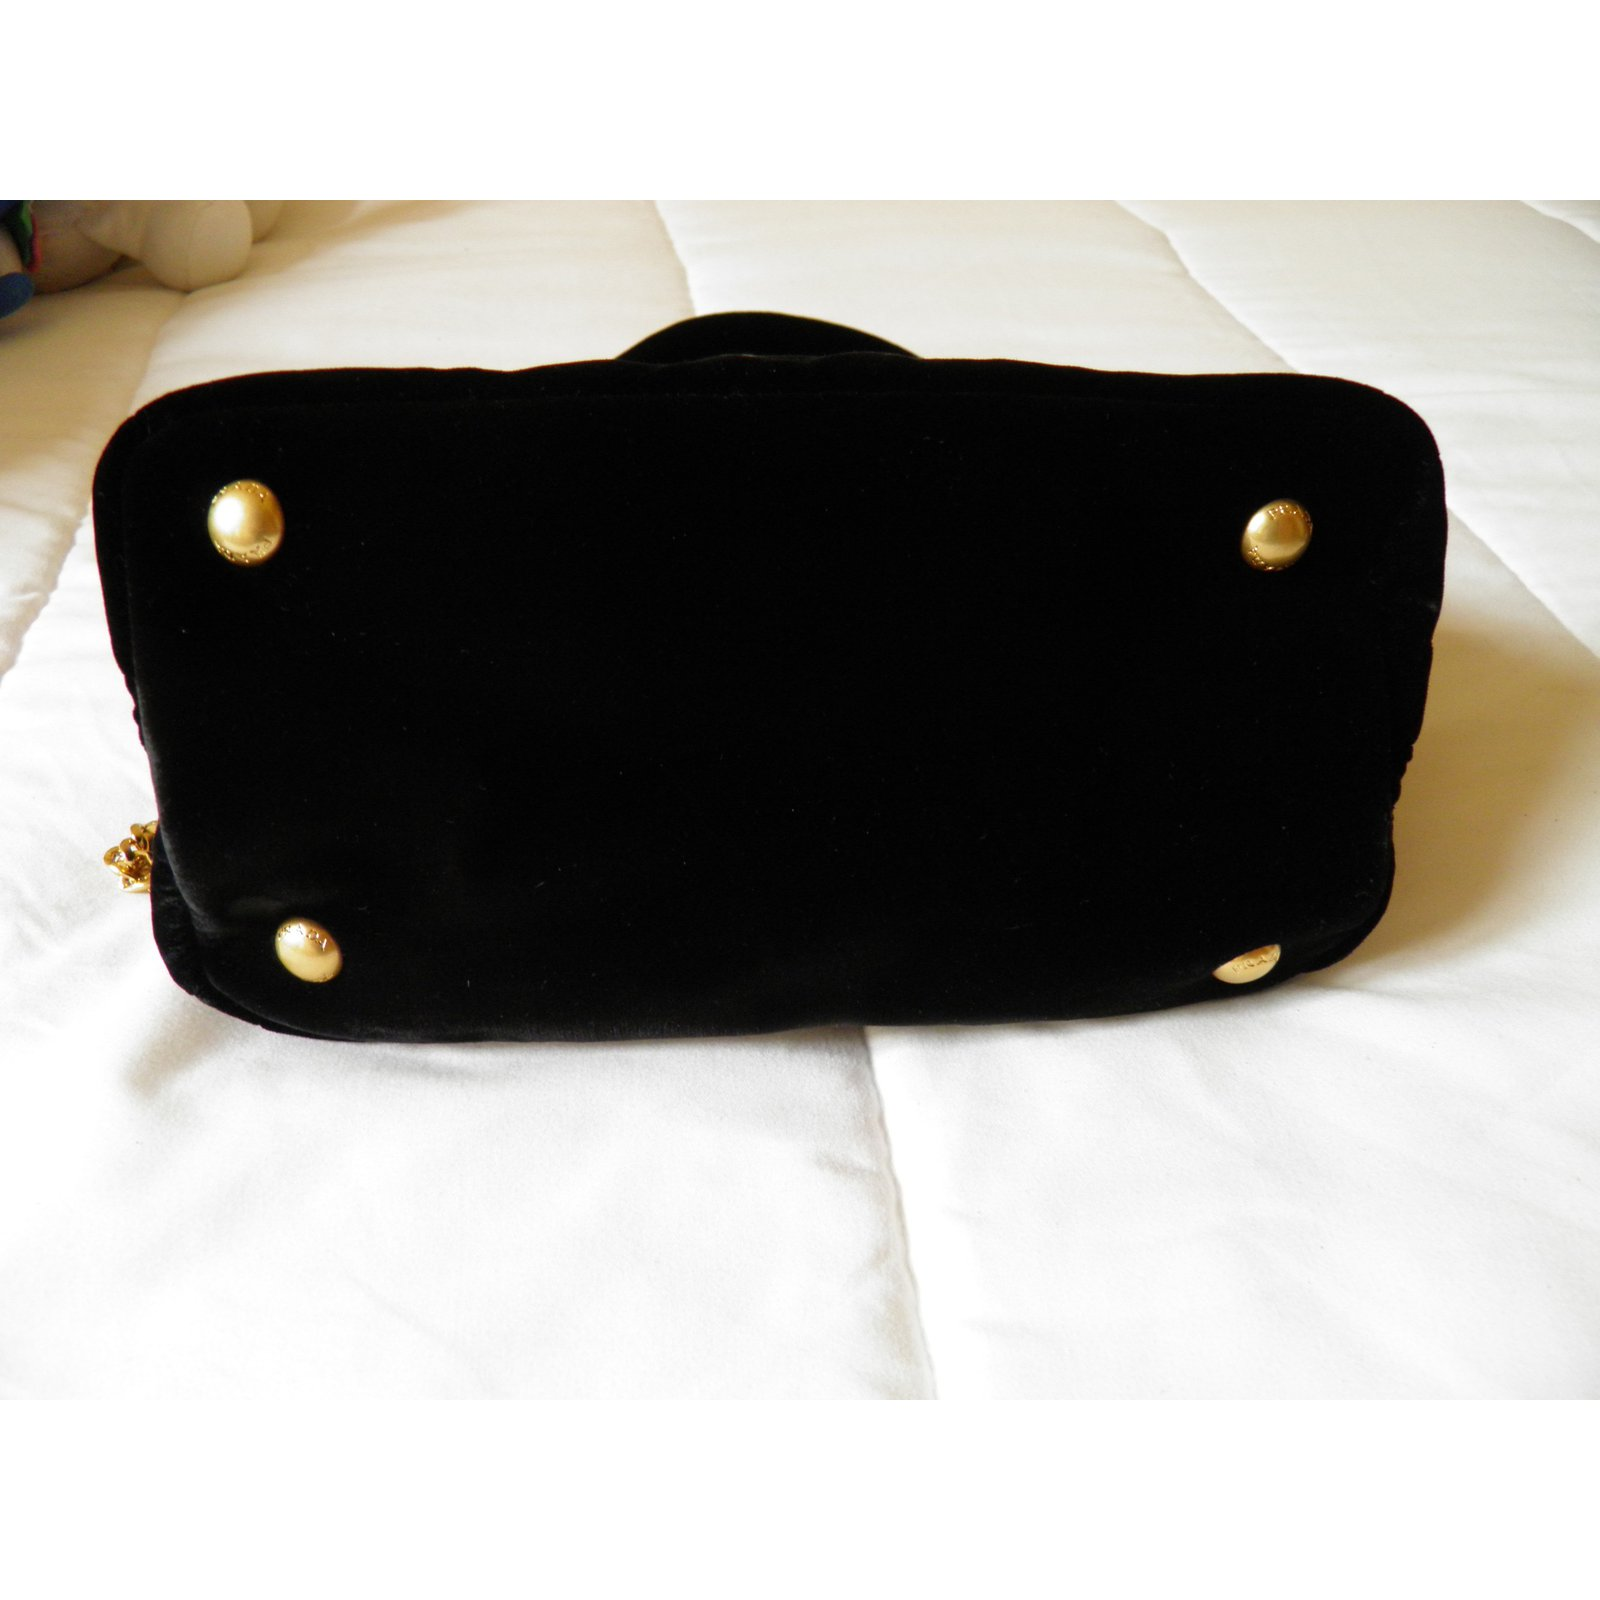 d3db8432c3a7 Facebook · Pin This. Prada mini bag Handbags Velvet Black ref.68886